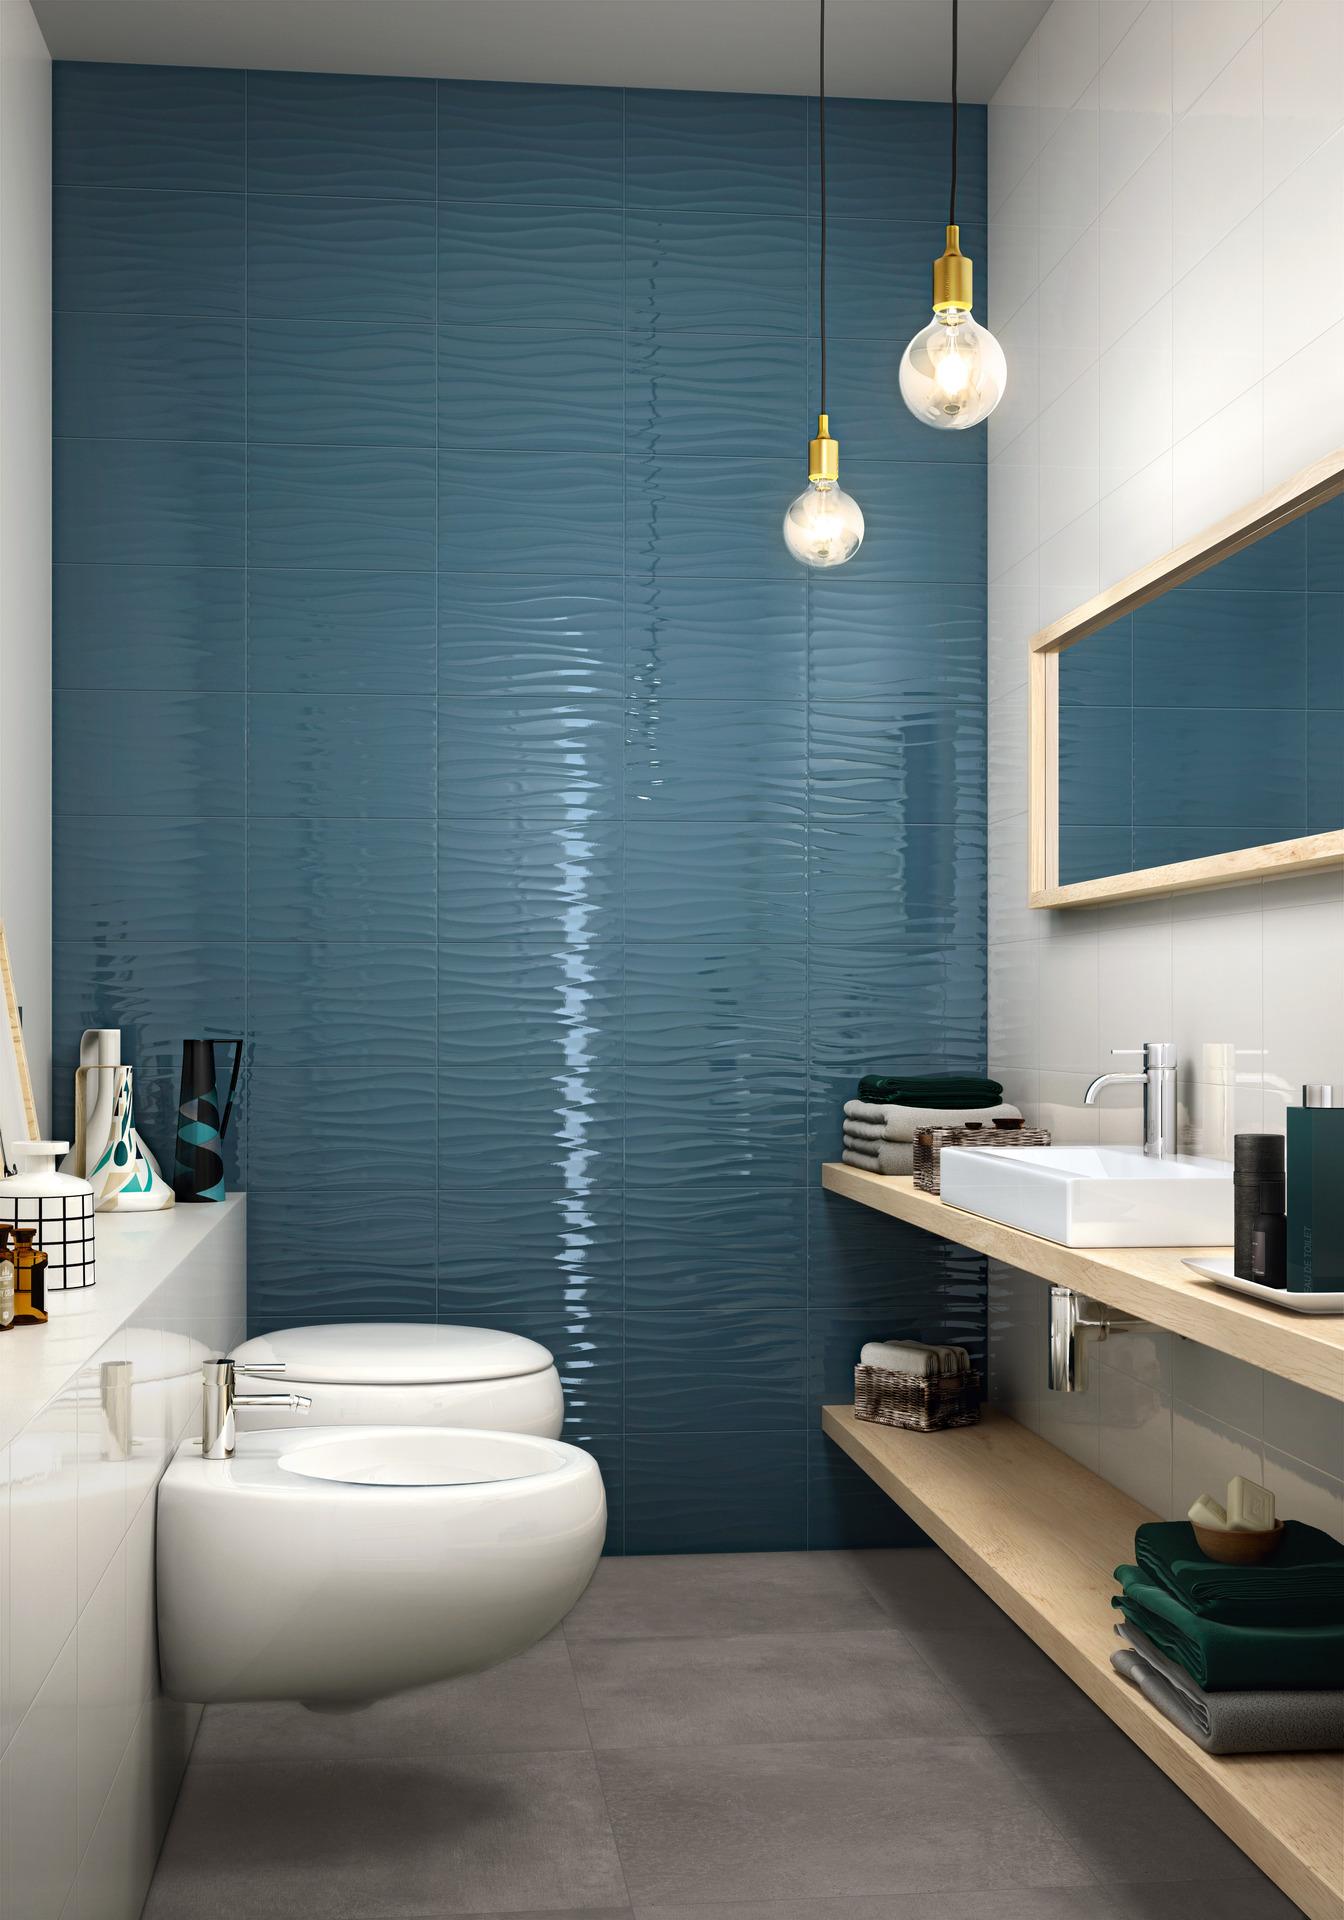 Piastrelle bagno in gres porcellanato ragno for Mosaic salle de bain